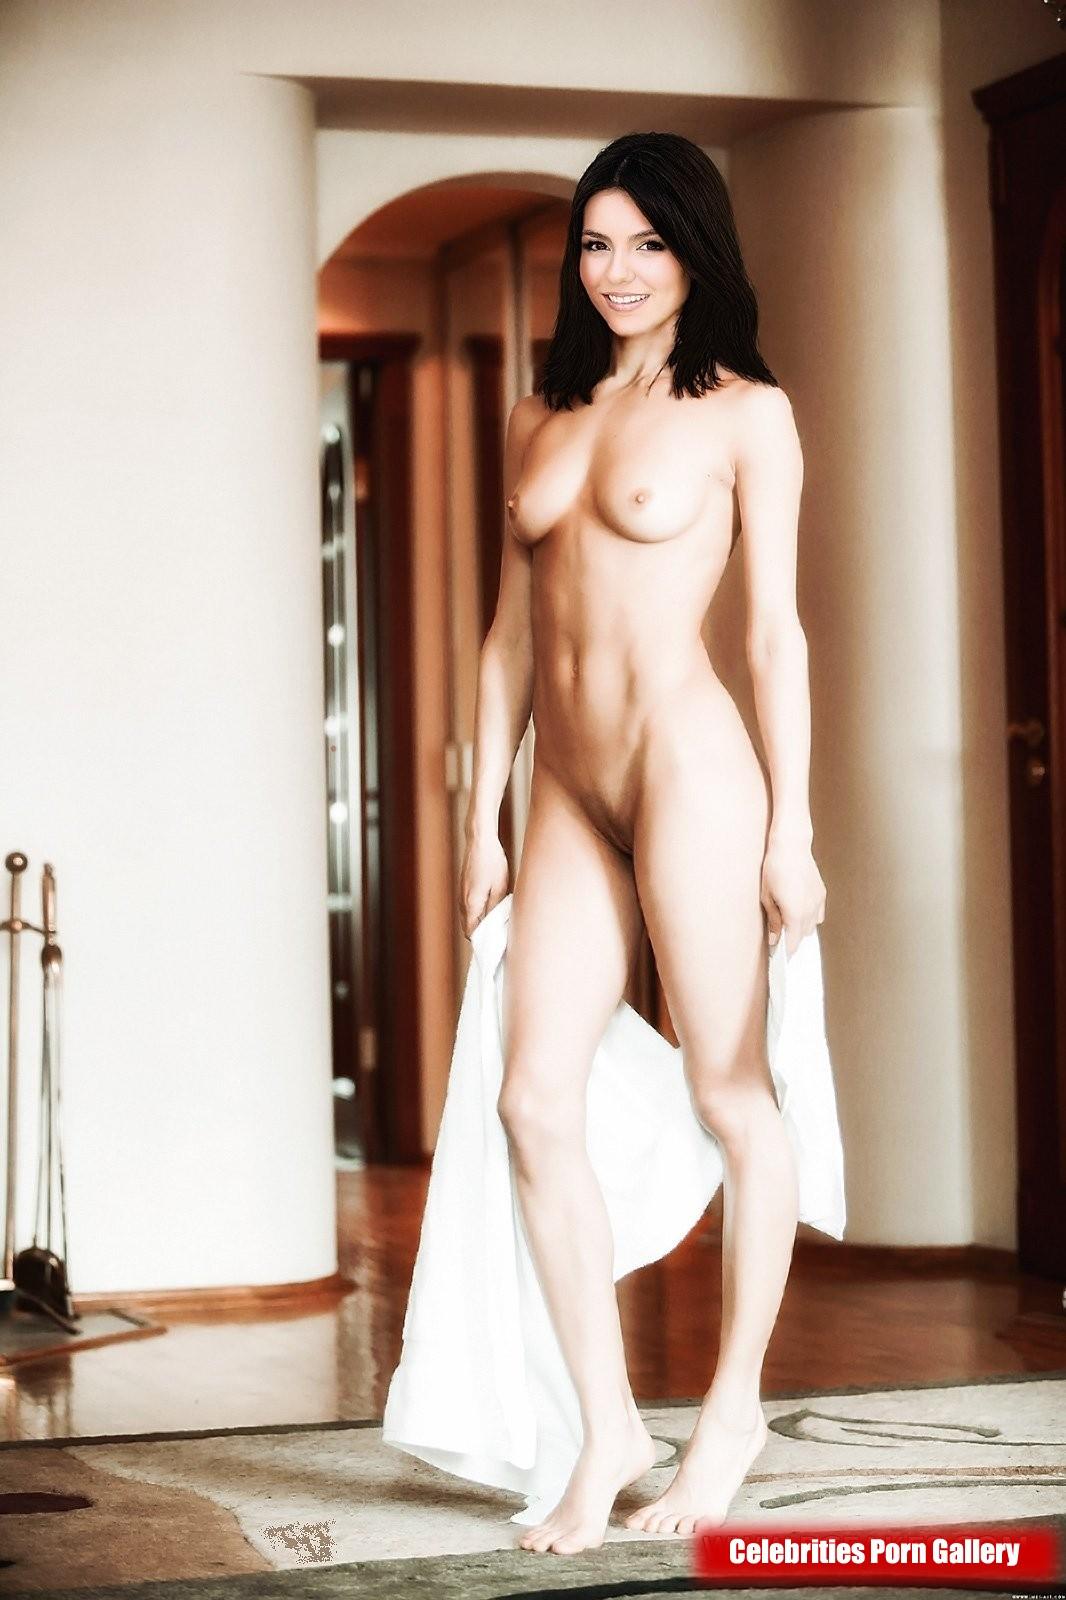 Victoria Justice Nude Celeb Pics free nude celeb pics